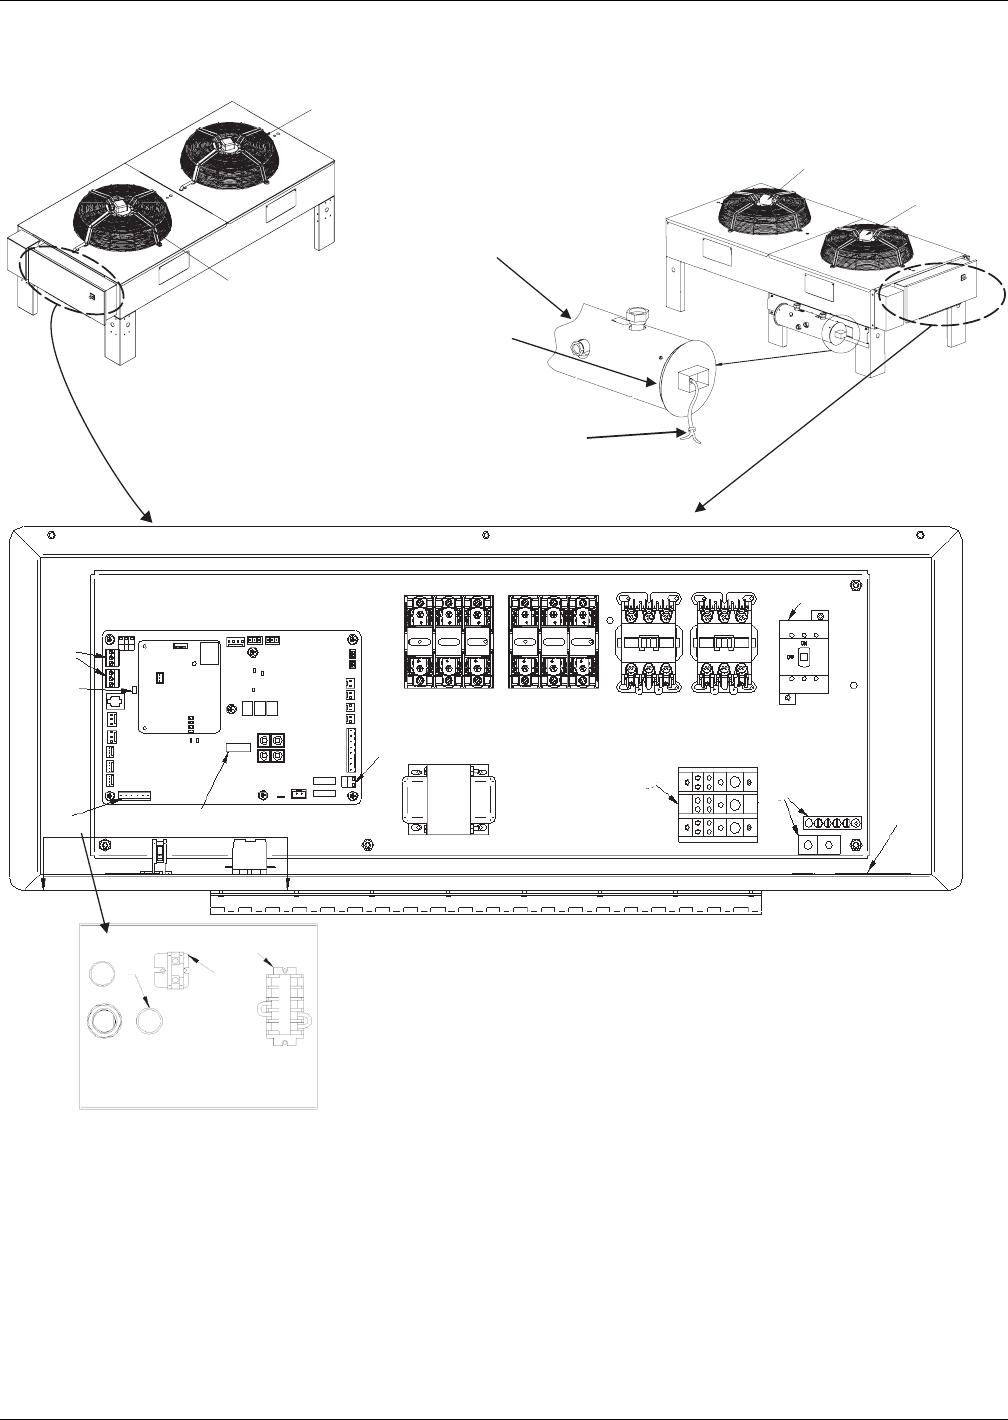 Emerson Liebert Mc Microchannel Outdoor Condenser 28 220Kw Users Manual  19536UserManual.wiki